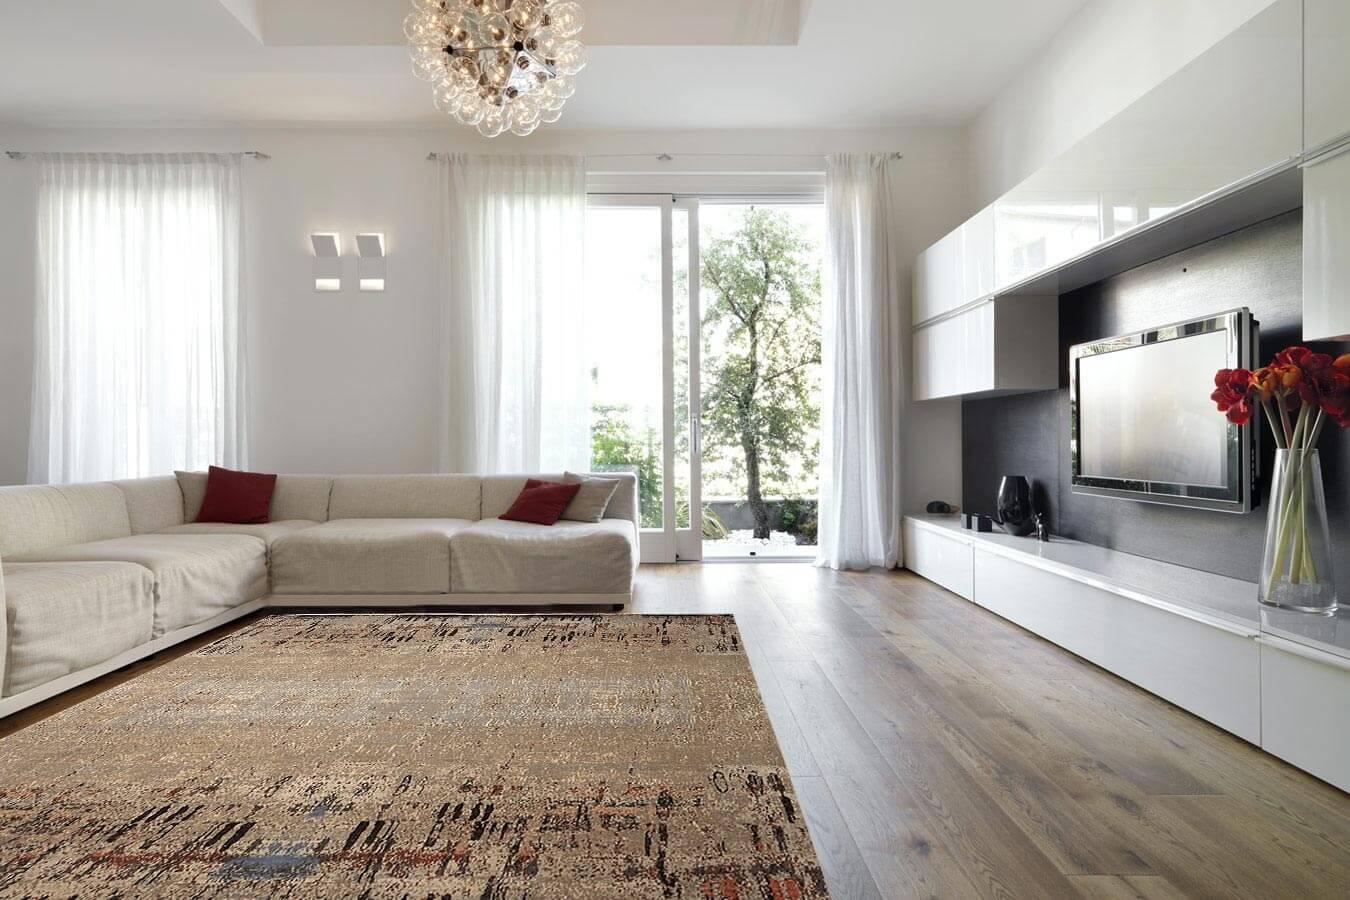 avant-garde-texture-tapijt-modern-design-int2